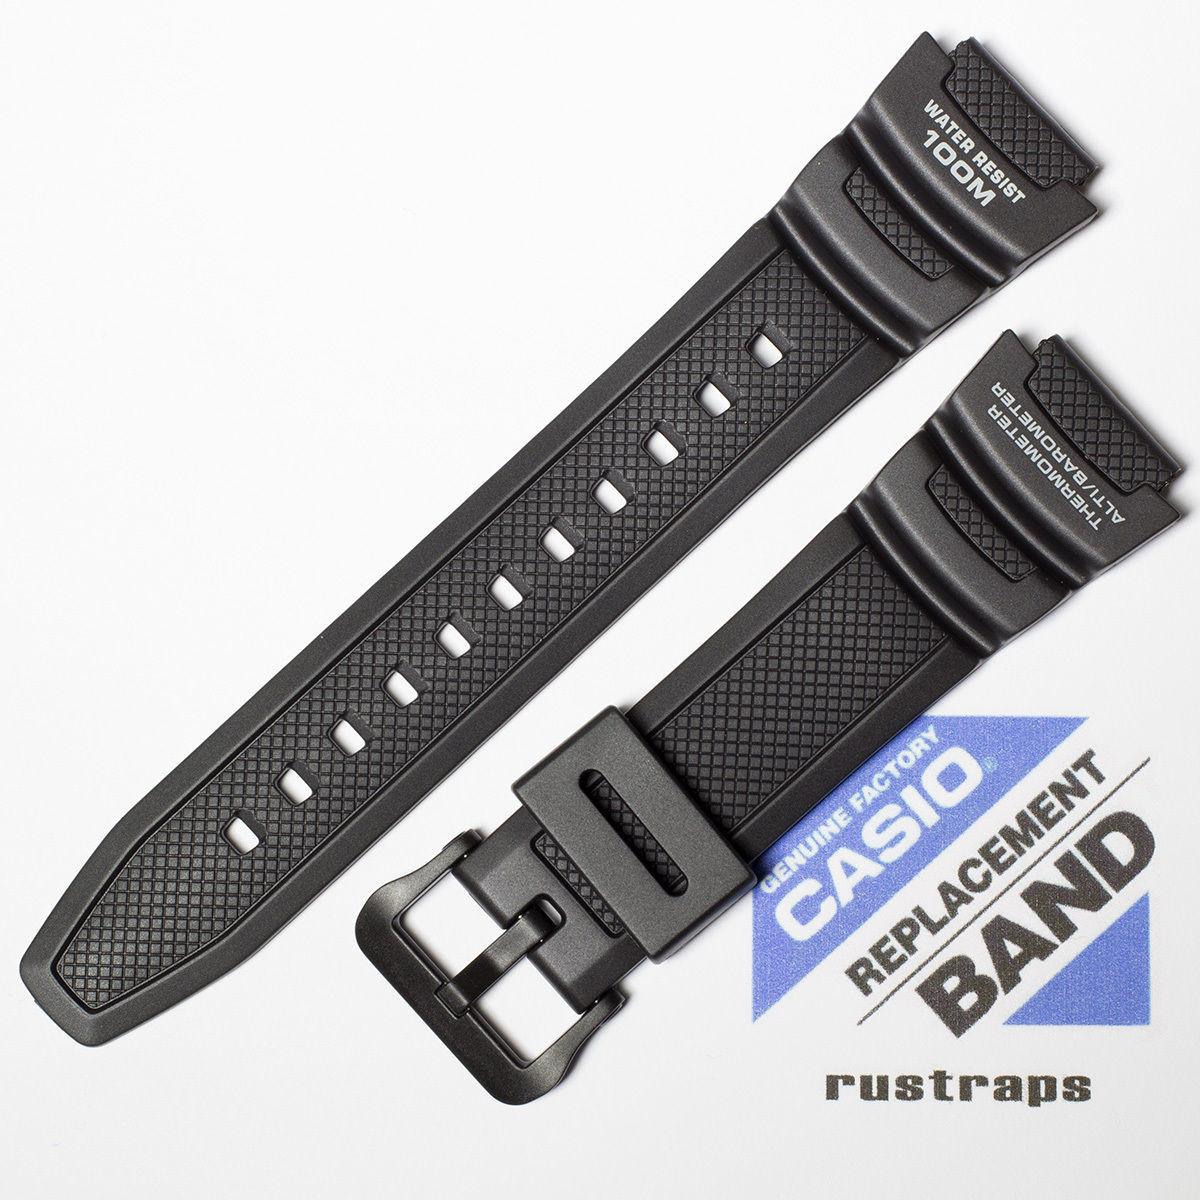 Оригинальный ремешок к часам Casio SGW-300H-1AV, SGW-400H-1BV